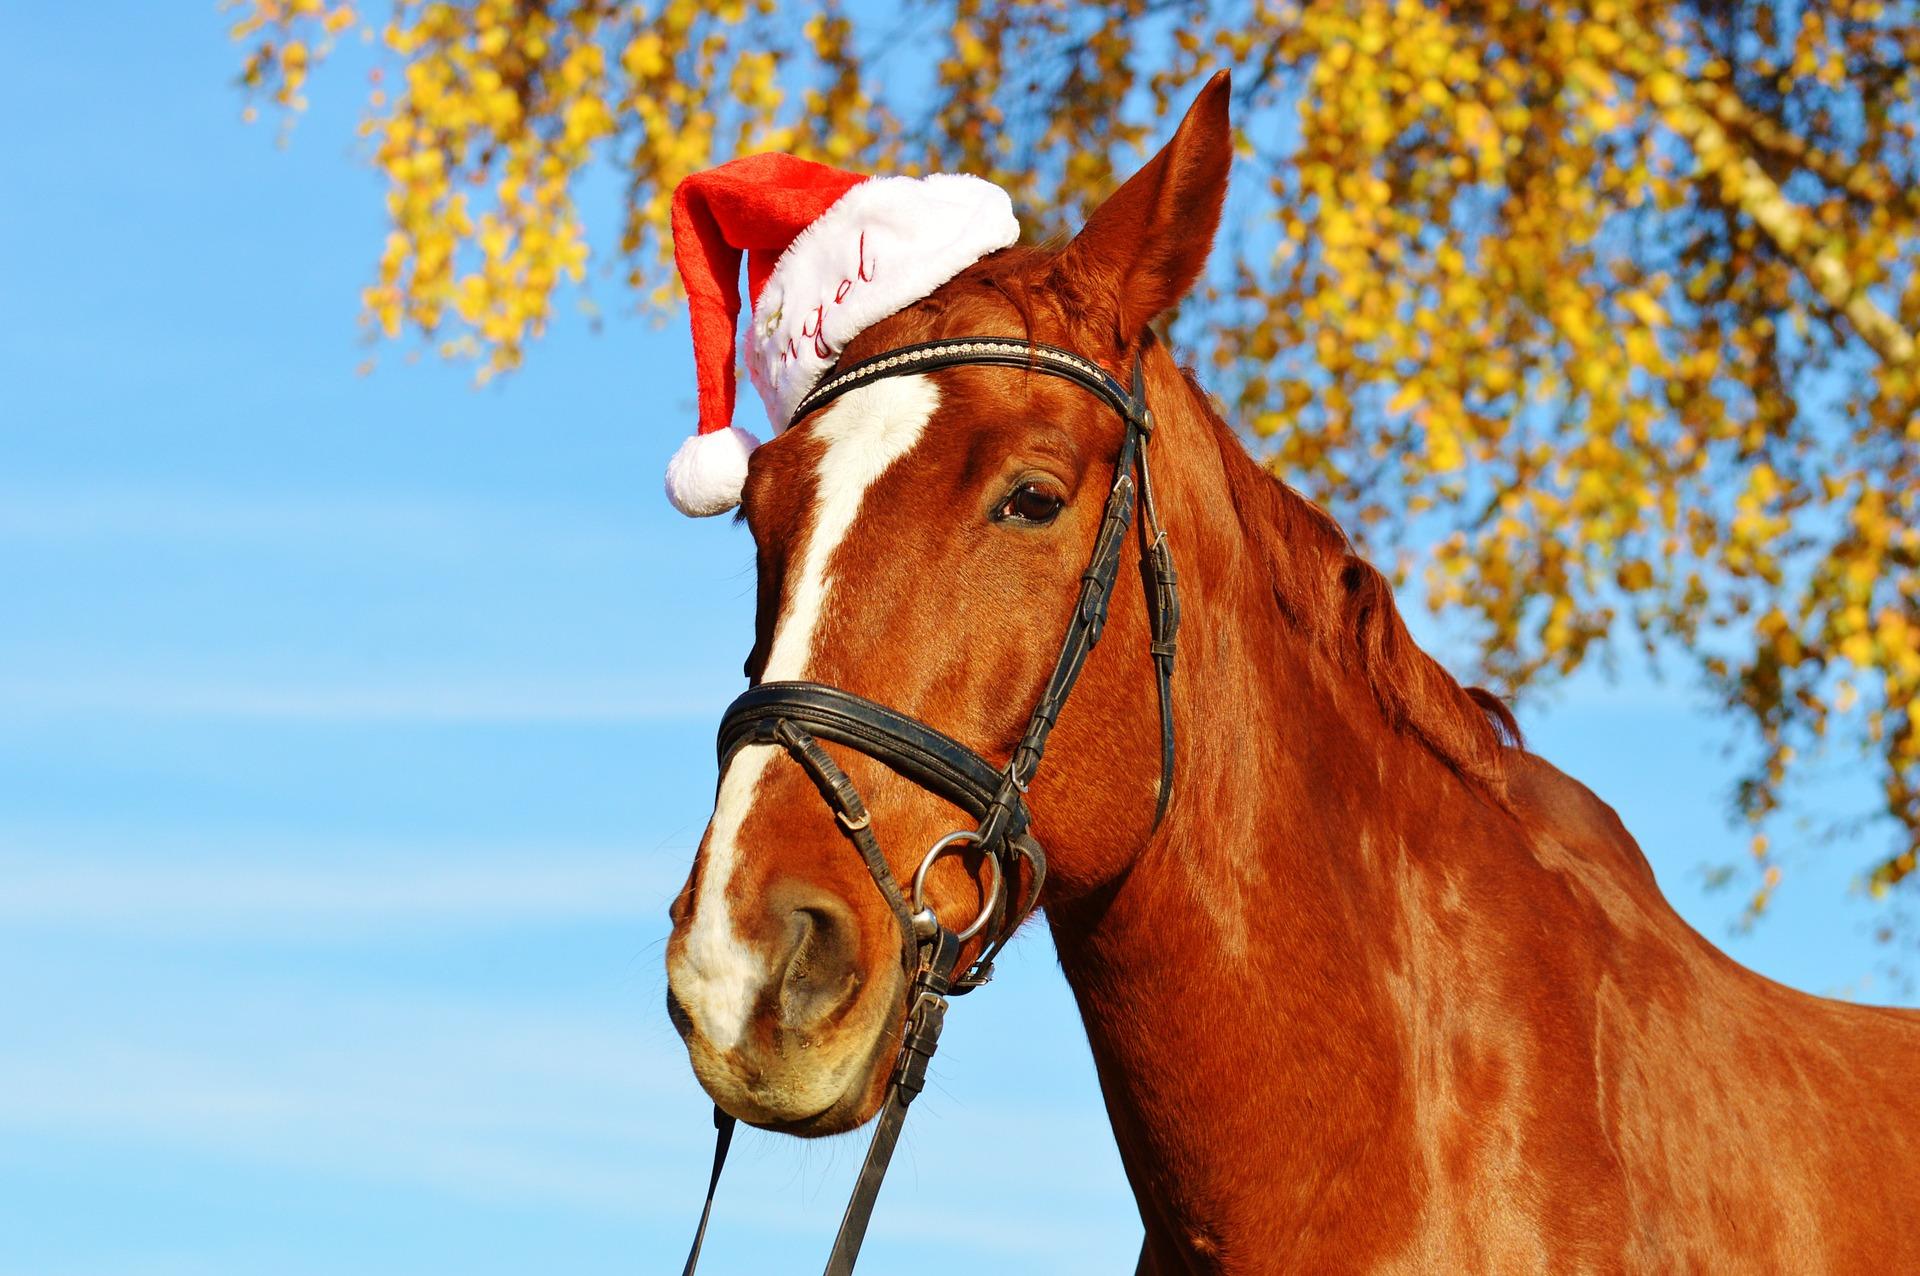 horse-1036123_1920.jpg